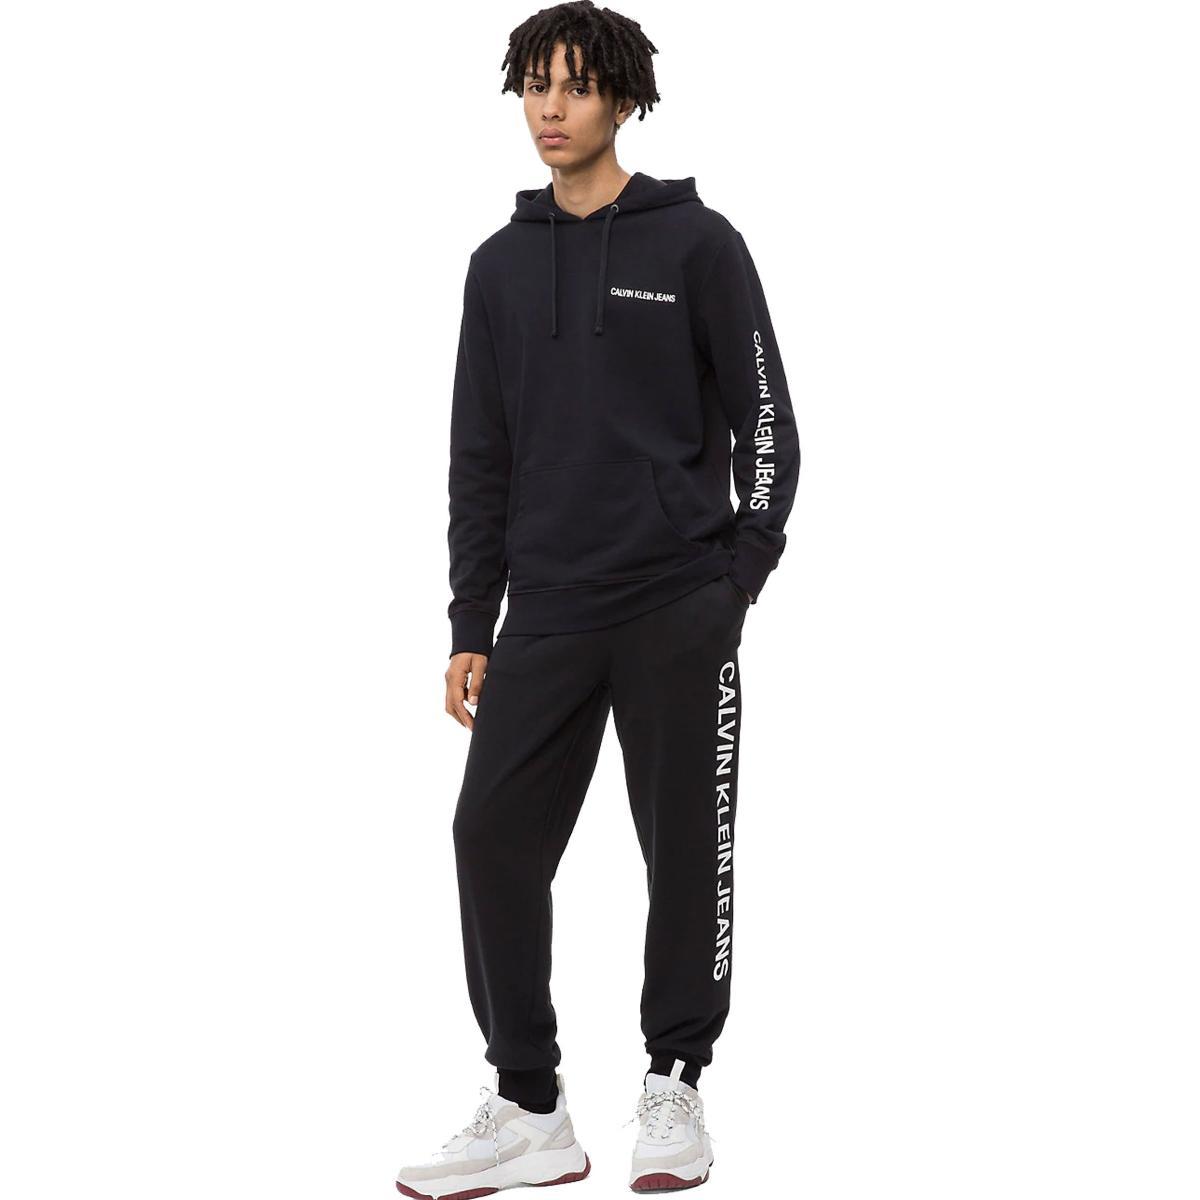 Pantaloni tuta con logo Calvin Klein da uomo rif. J30J309801